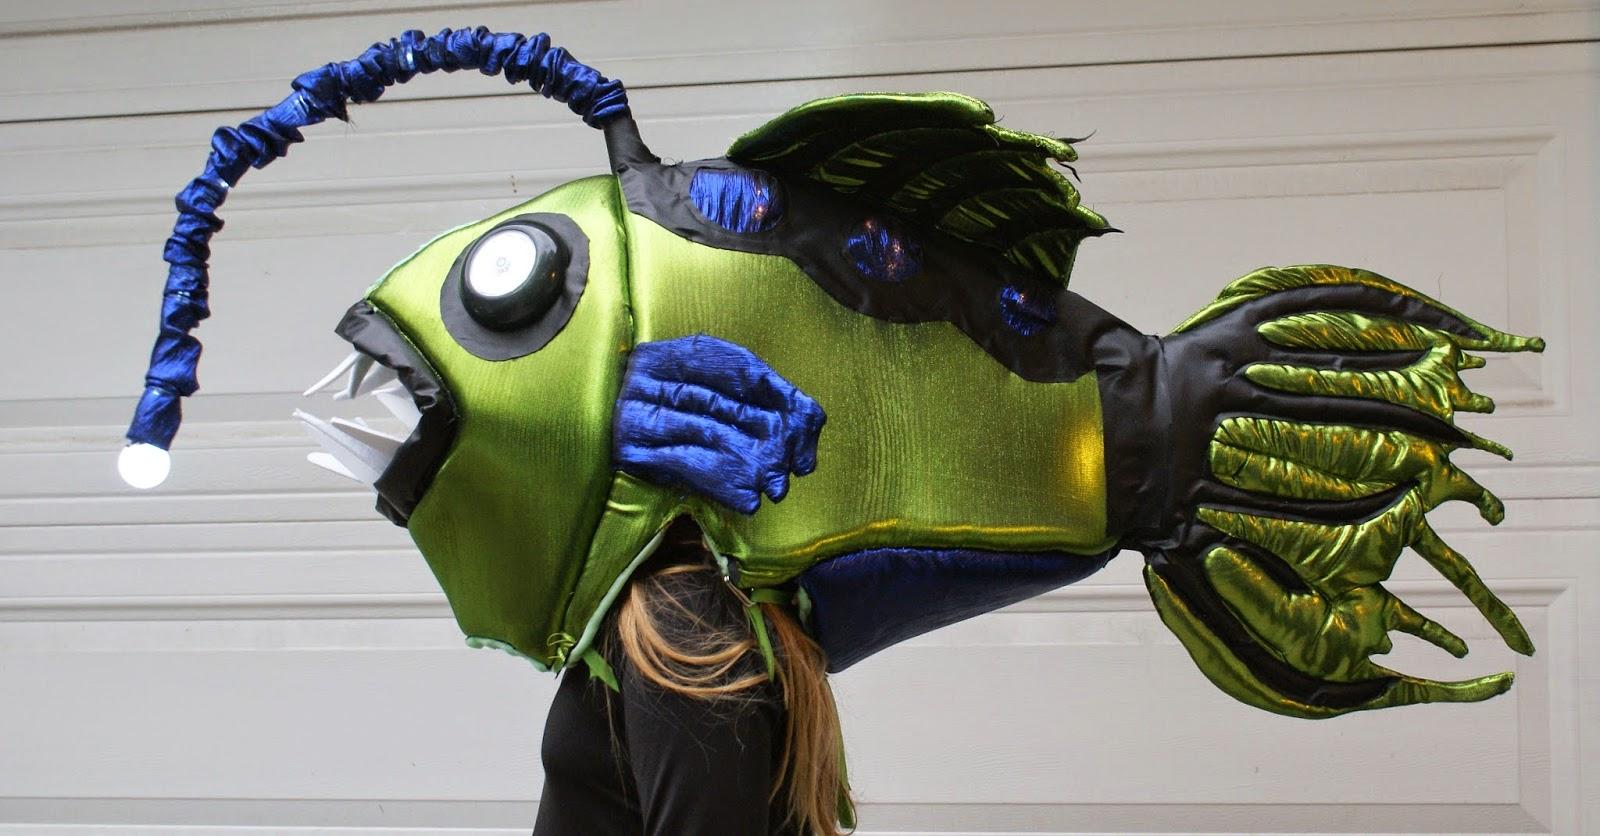 Amuse me blog angler fish costume for halloween for Angler fish costume